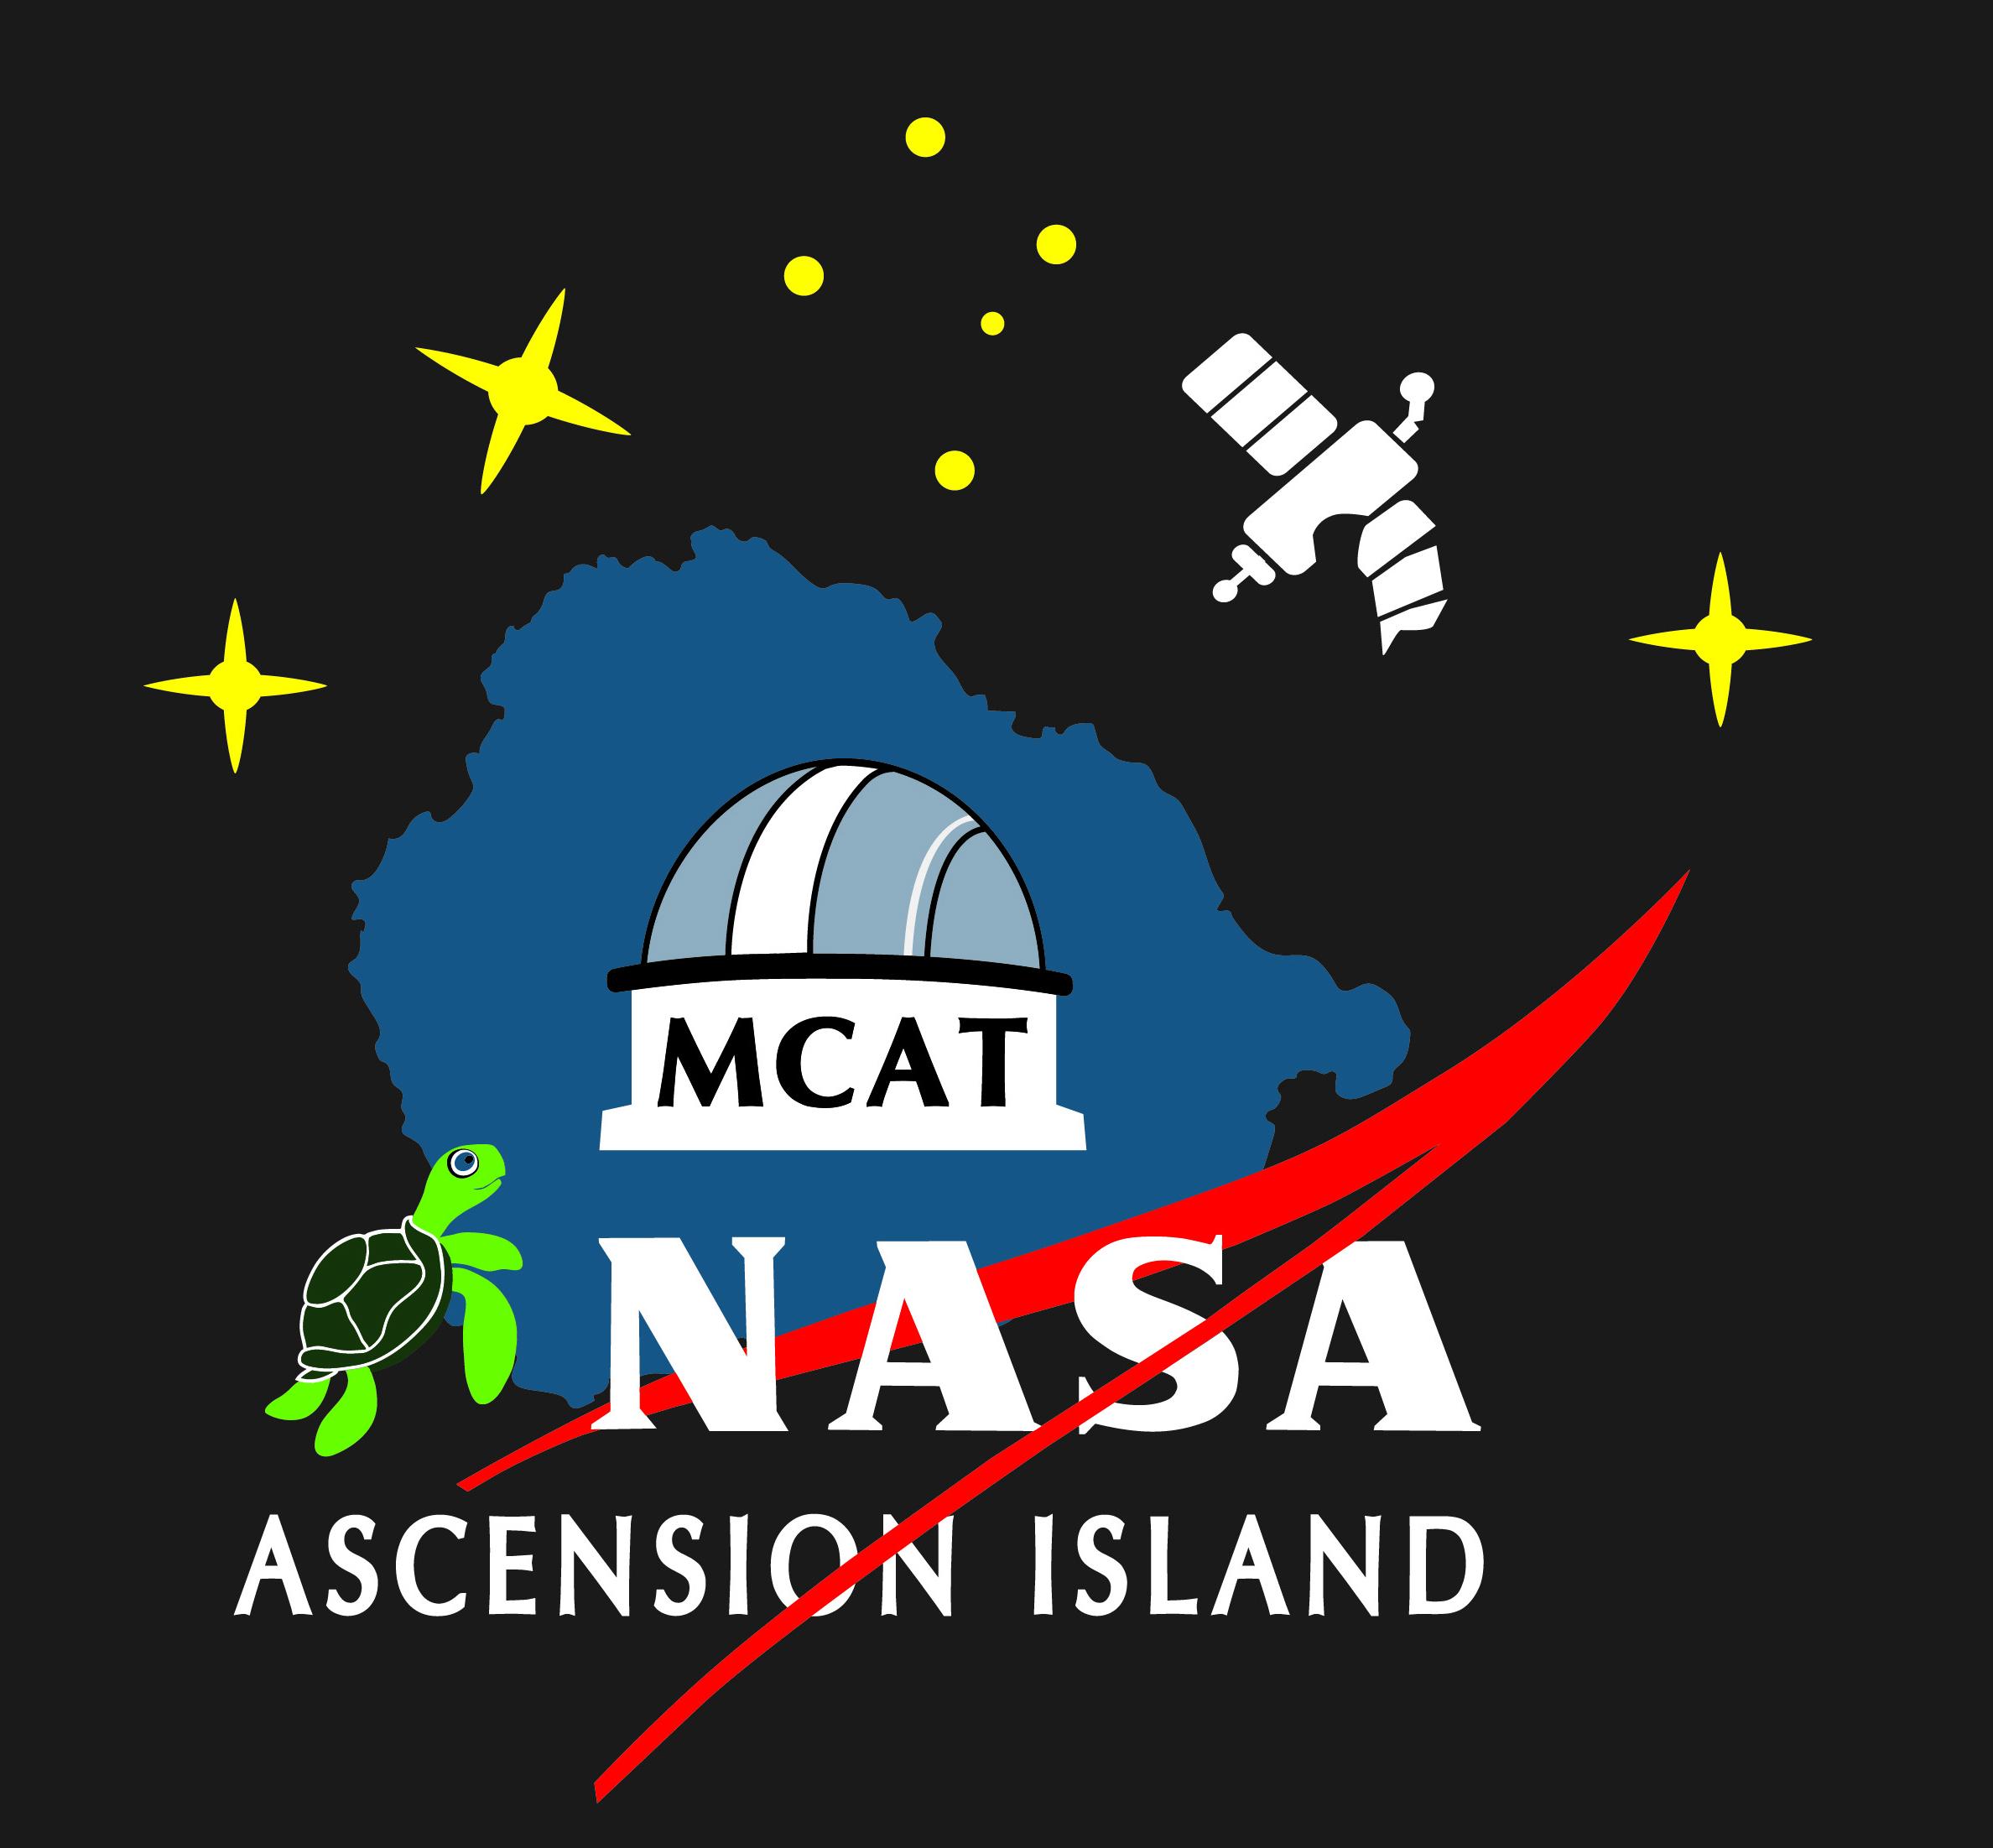 NASA ASI MCAT logo